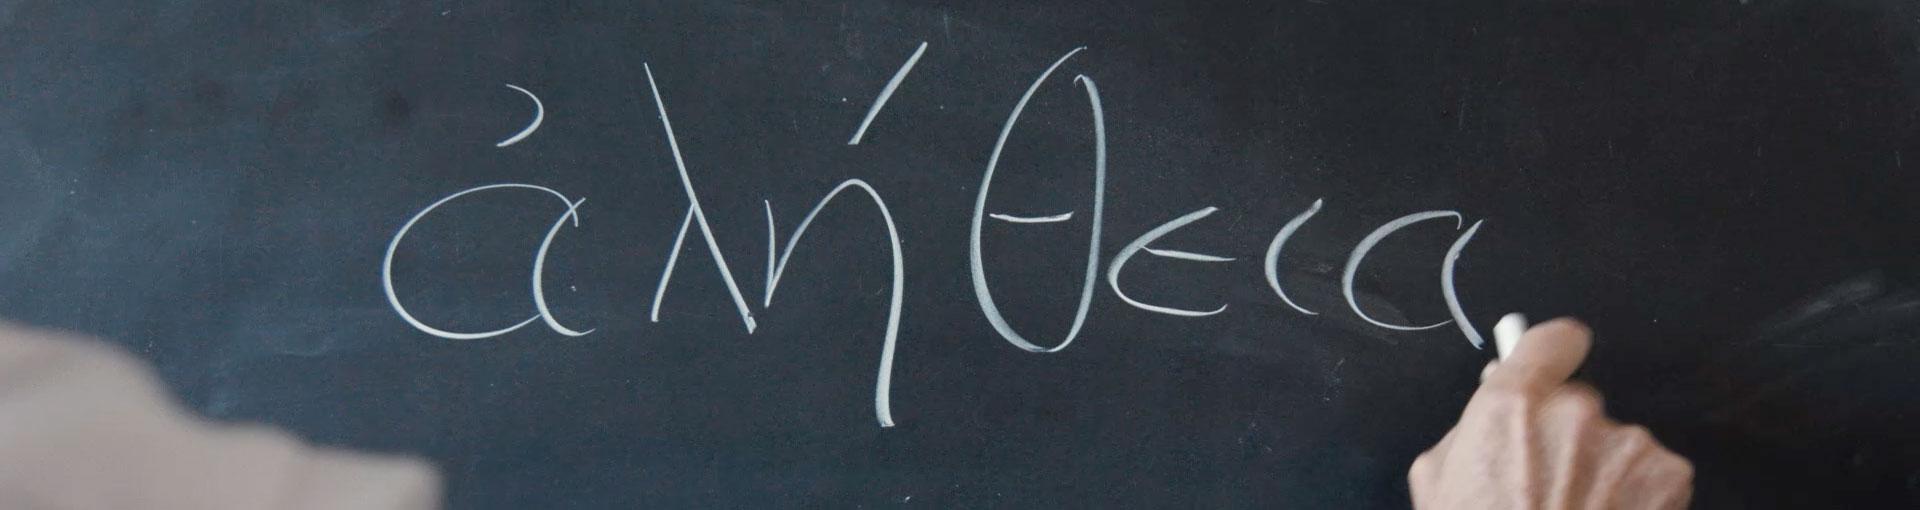 Dayspring Christian Academy students learn Greek